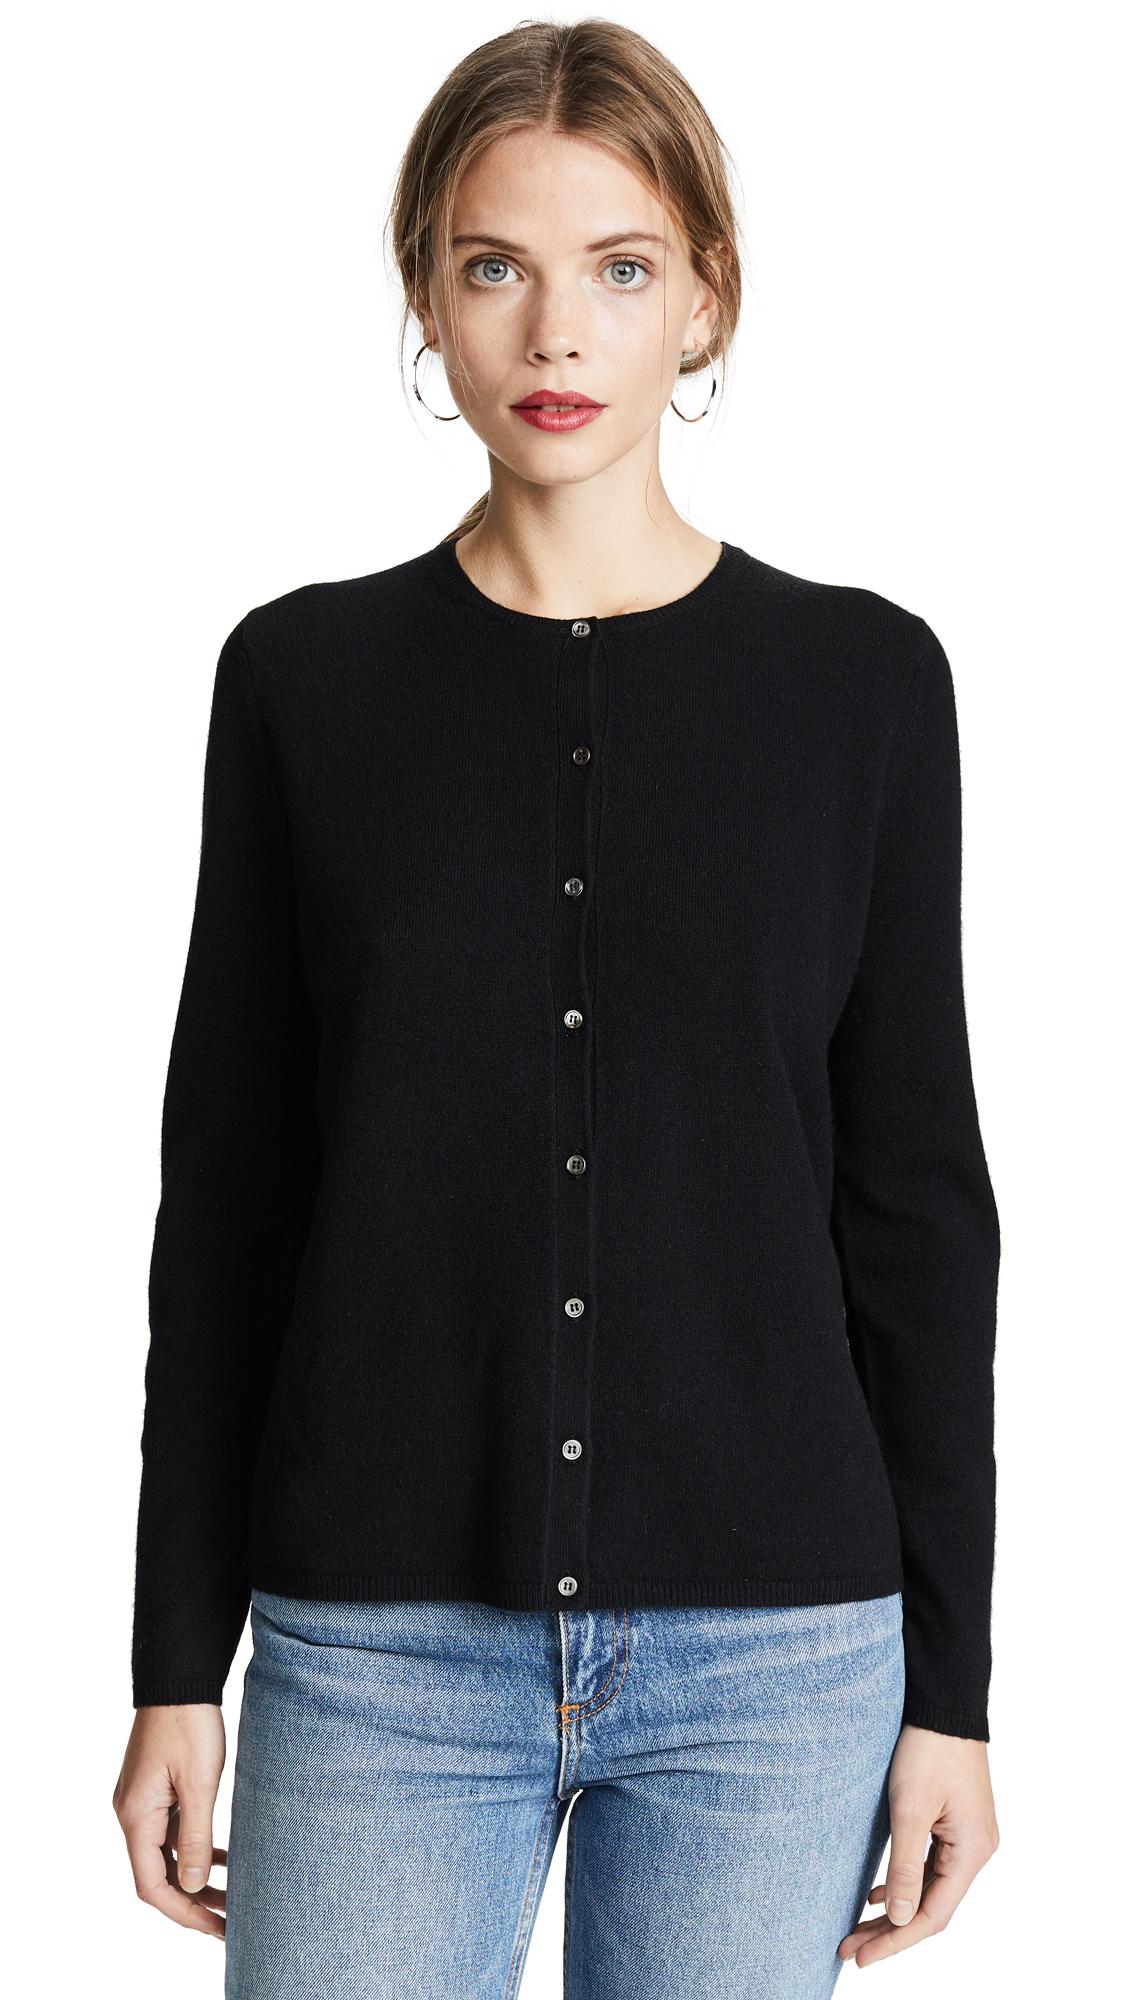 TSE Cashmere Long Sleeve Cardigan In Black